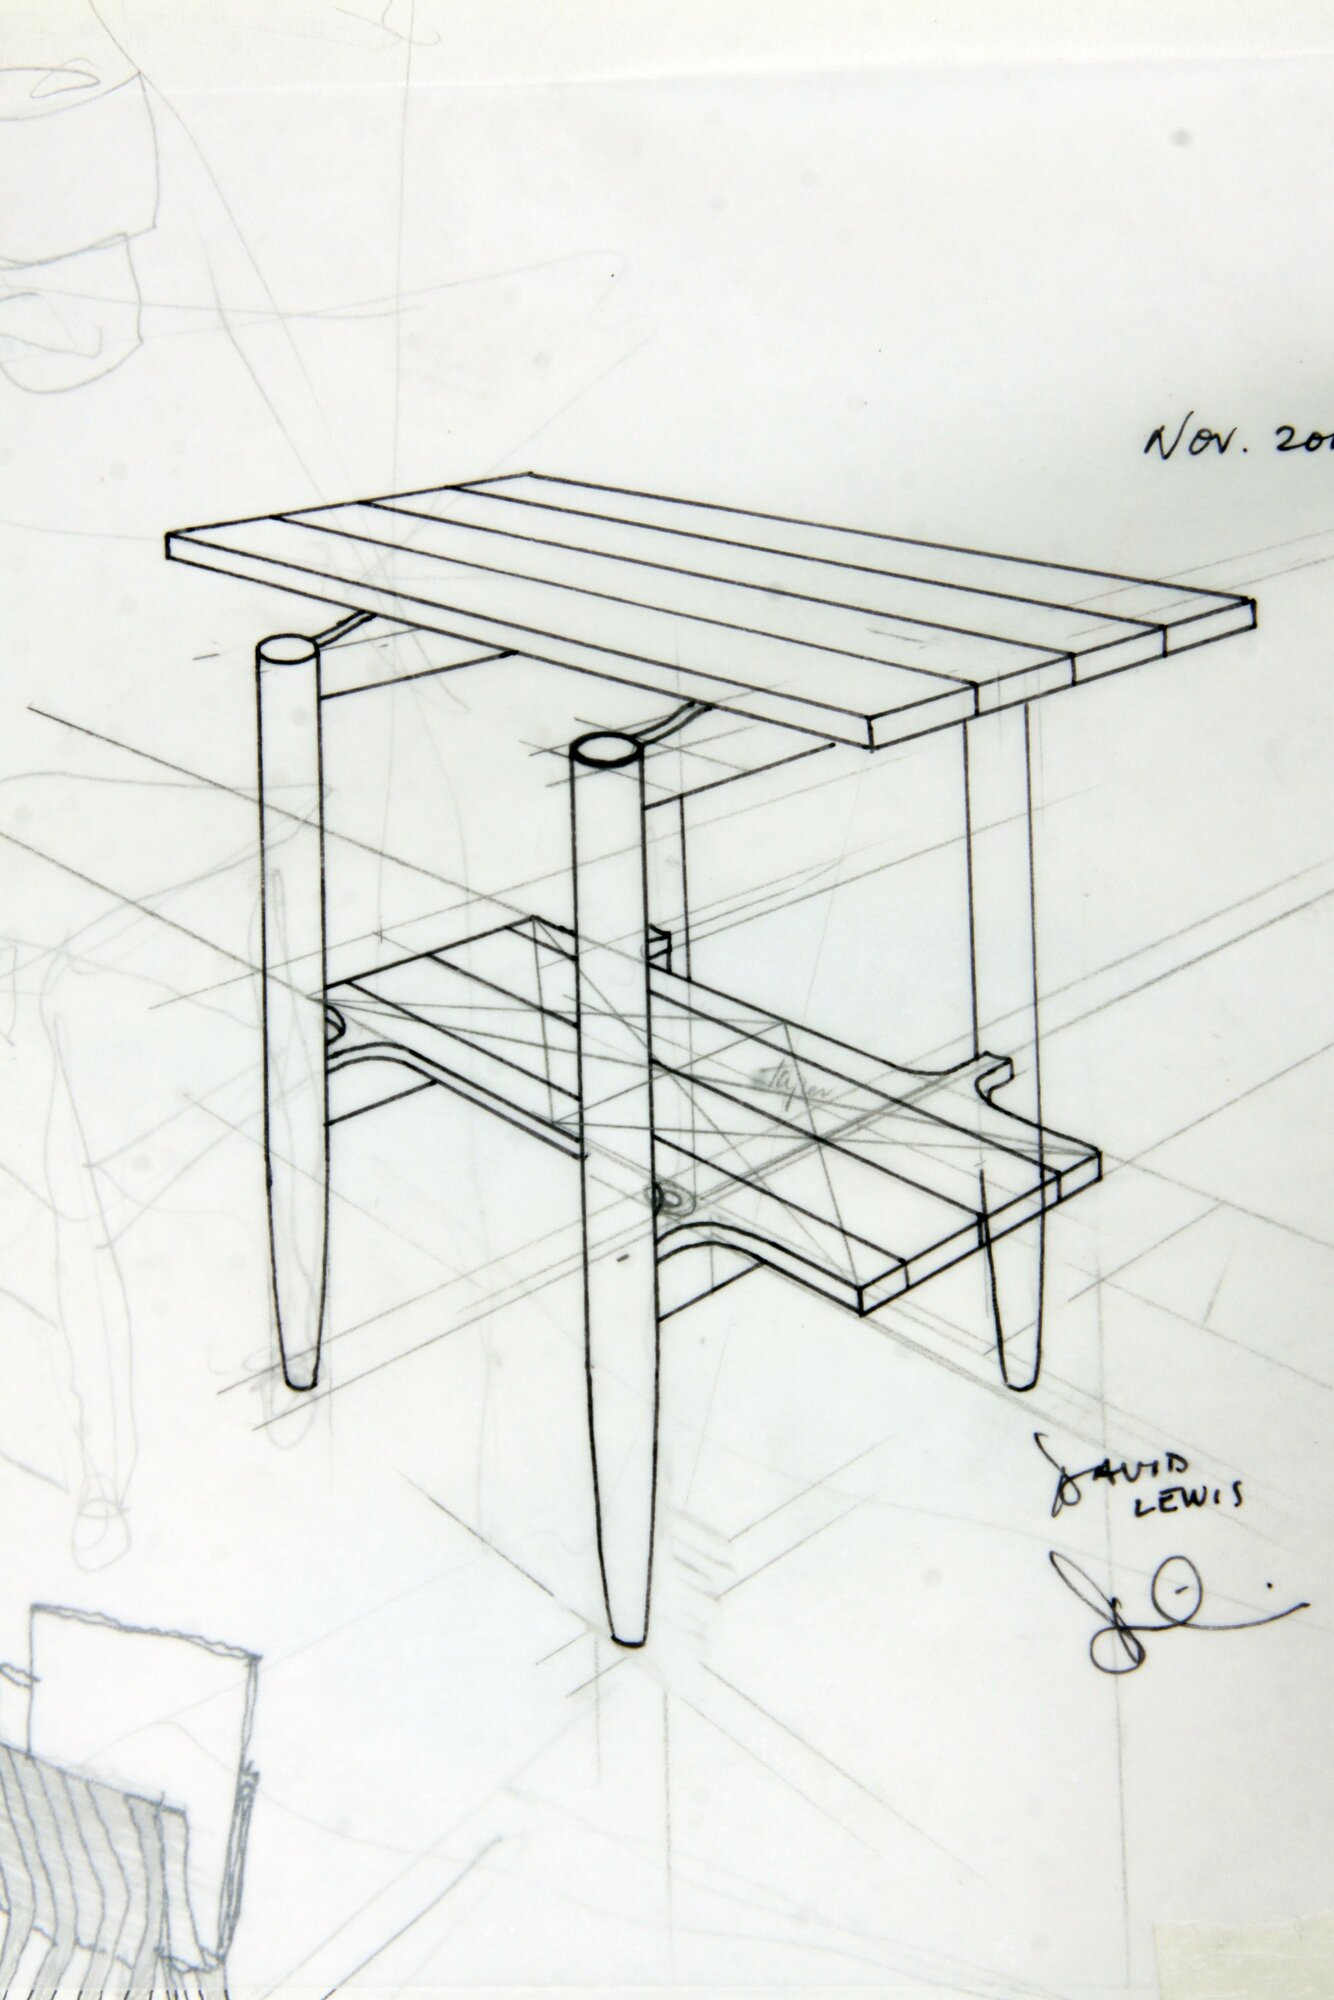 STP 01 [drawing]